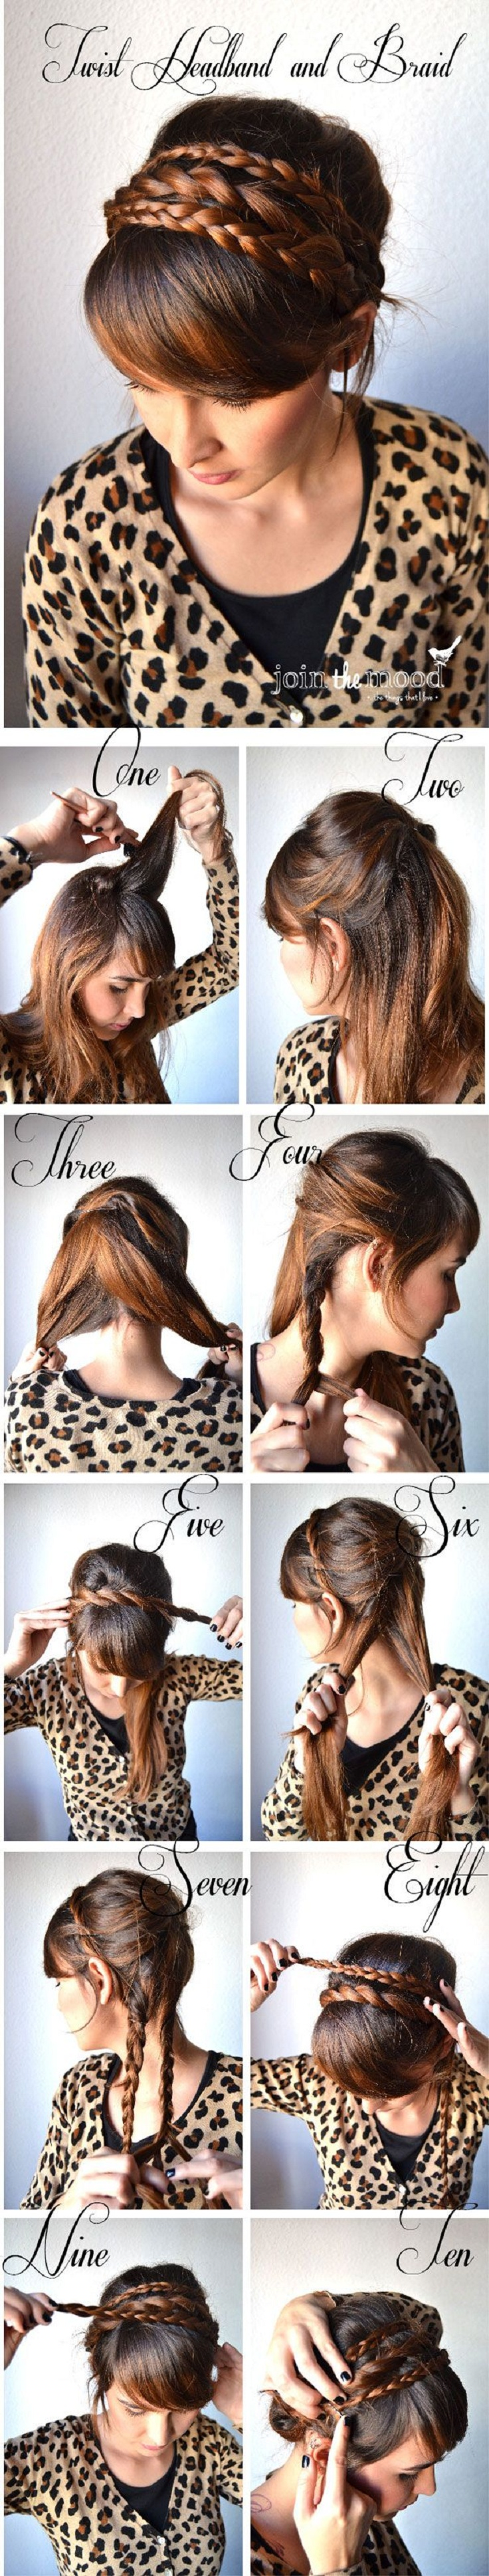 top-10-braid-tutorials_03